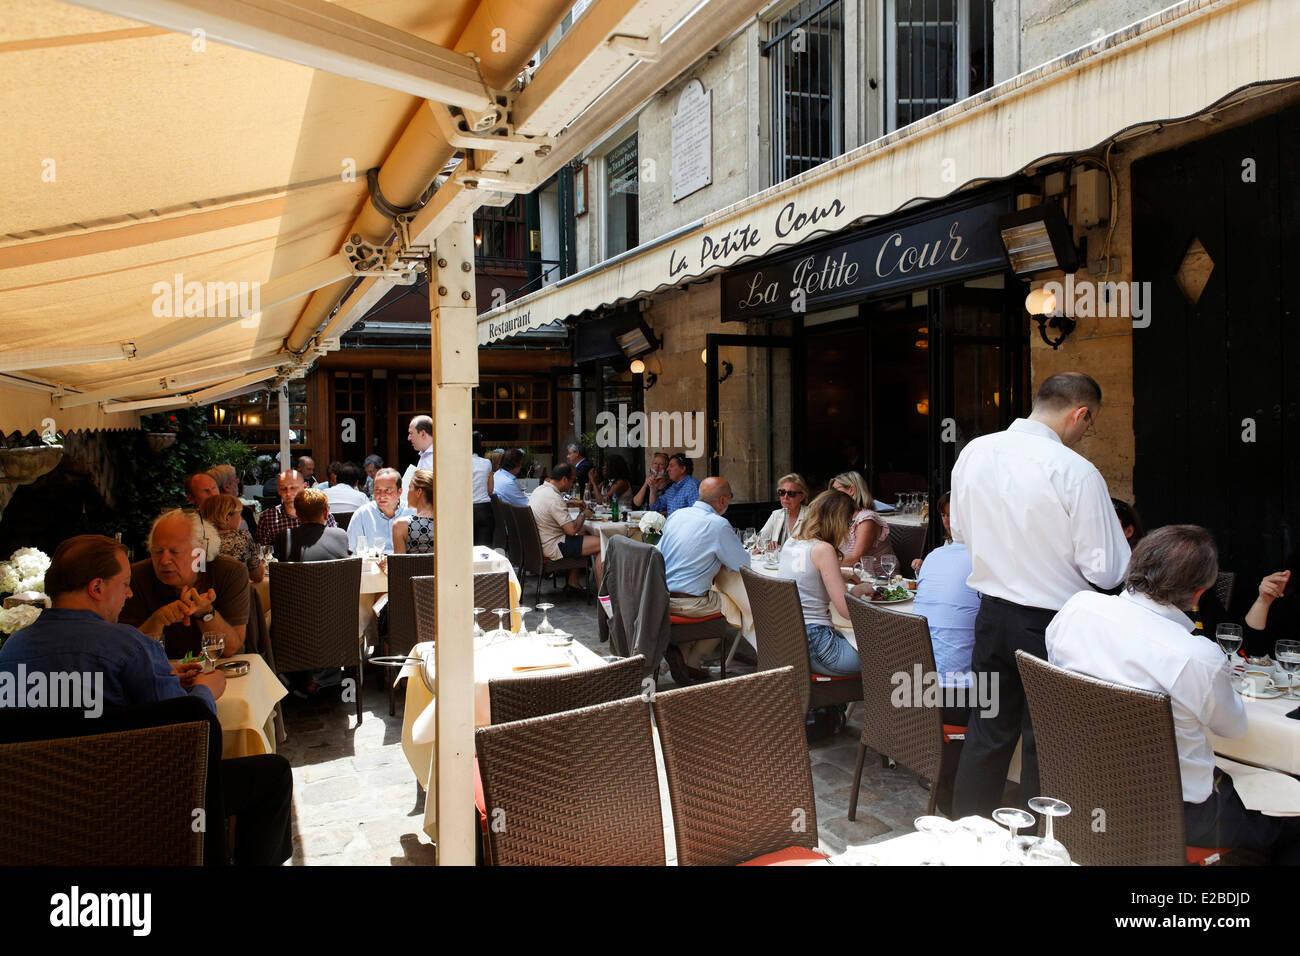 france paris restaurant la petite cour 8 rue mabillon stock photo royalty free image. Black Bedroom Furniture Sets. Home Design Ideas